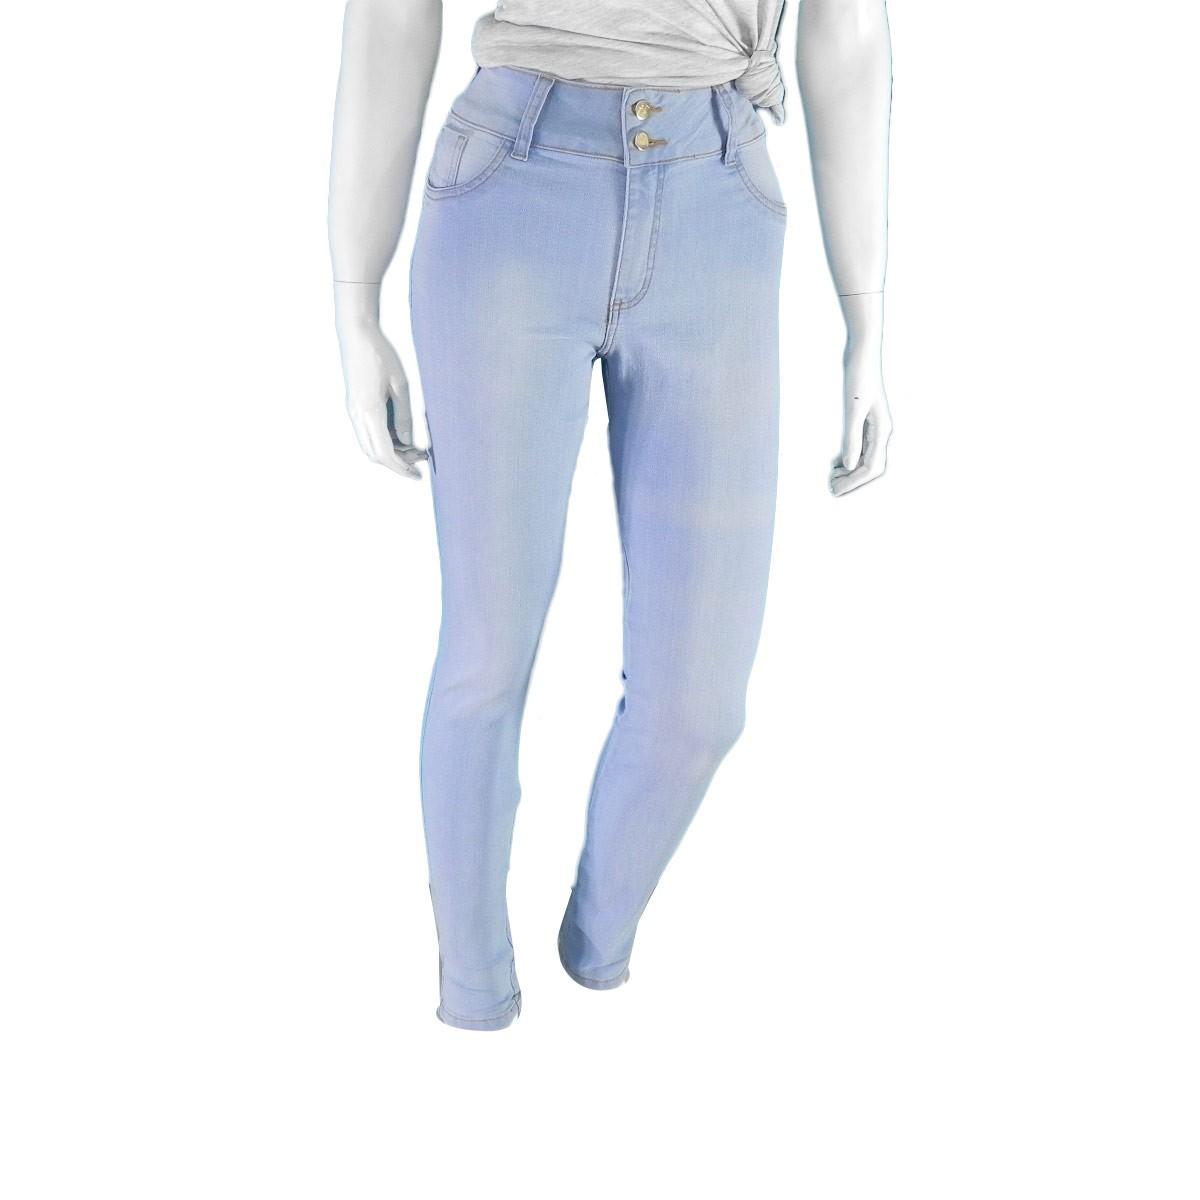 Calça Feminina Jeans 2 Botoes Delave